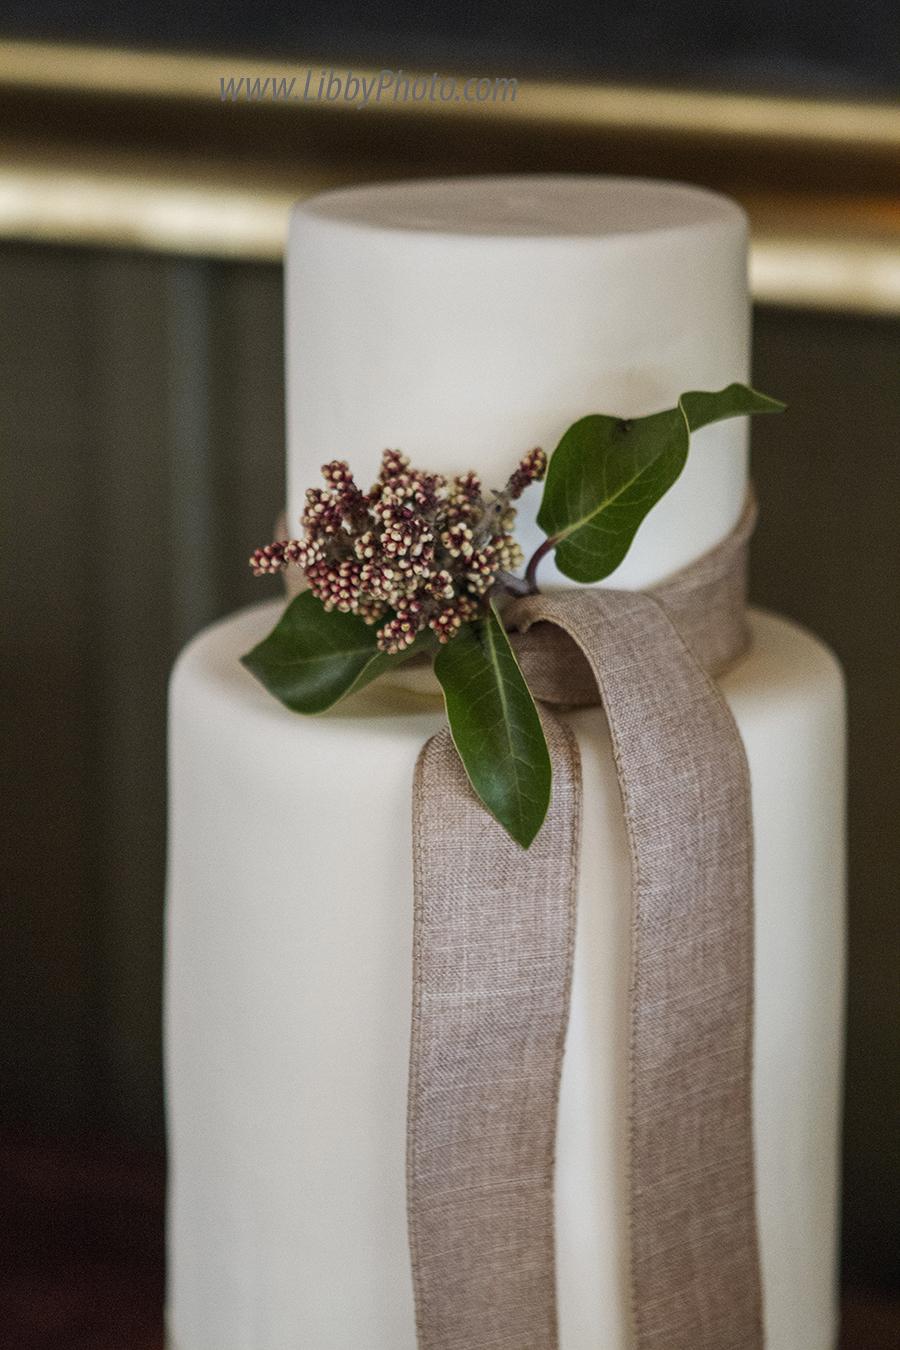 Atlanta wedding photography, Libbyphoto (18).jpg